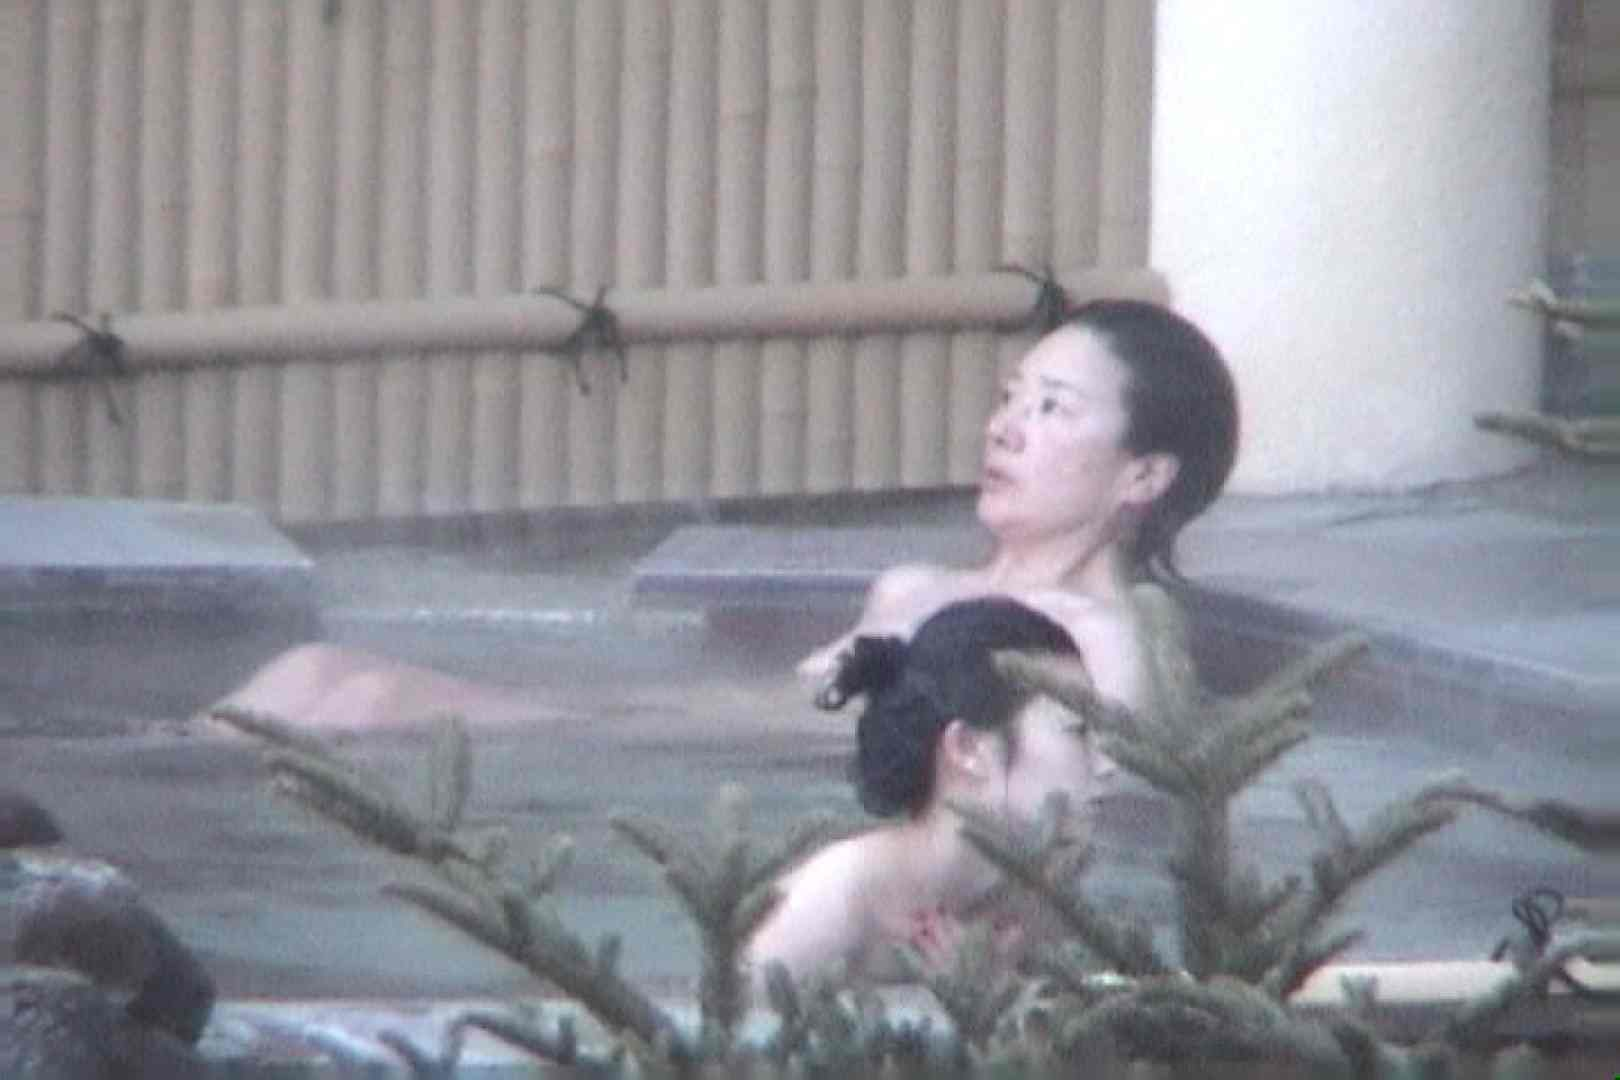 Aquaな露天風呂Vol.84【VIP限定】 露天 | 盗撮特撮  13pic 4